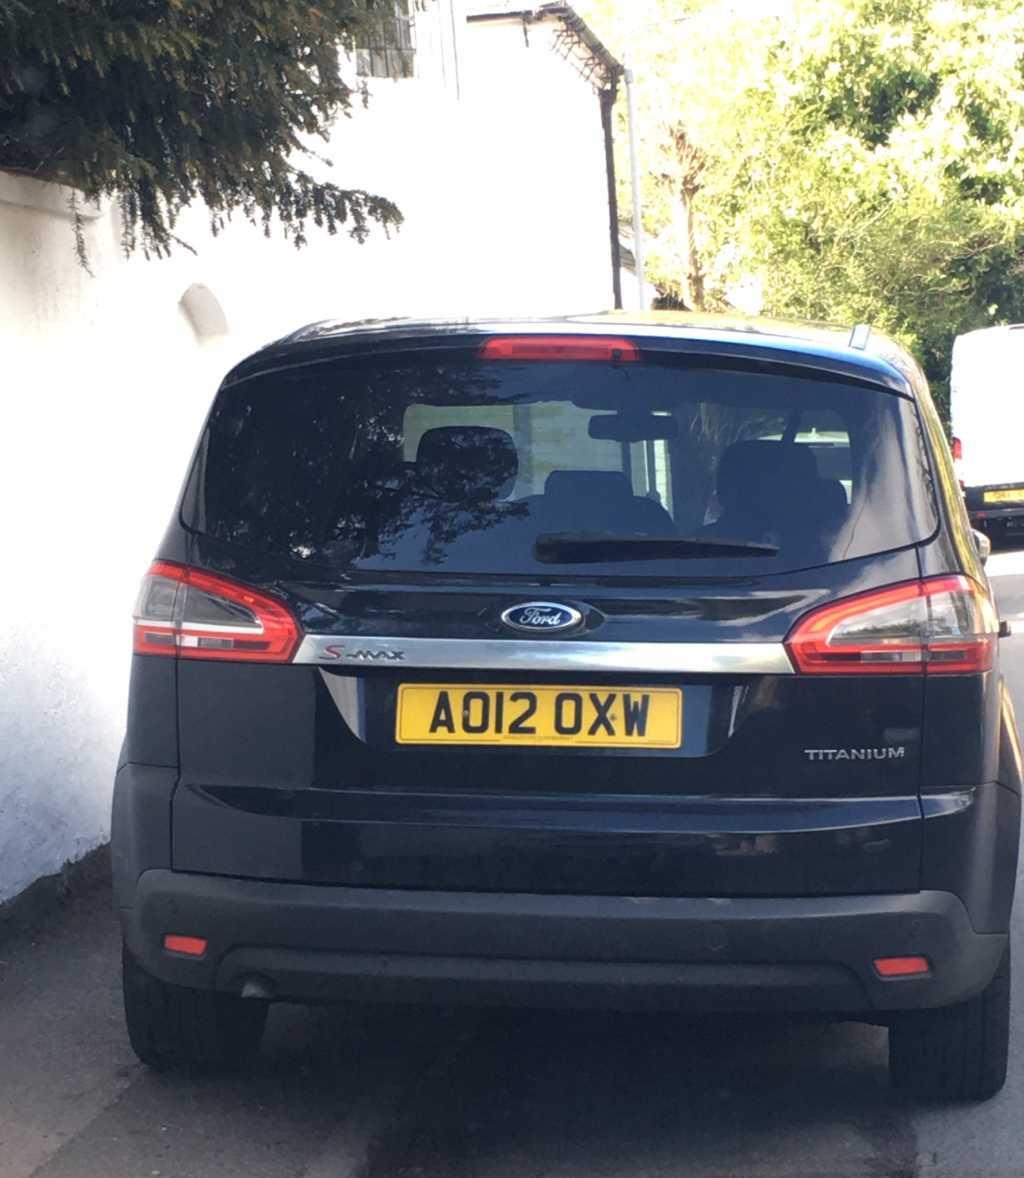 AO12 OXN displaying Selfish Parking